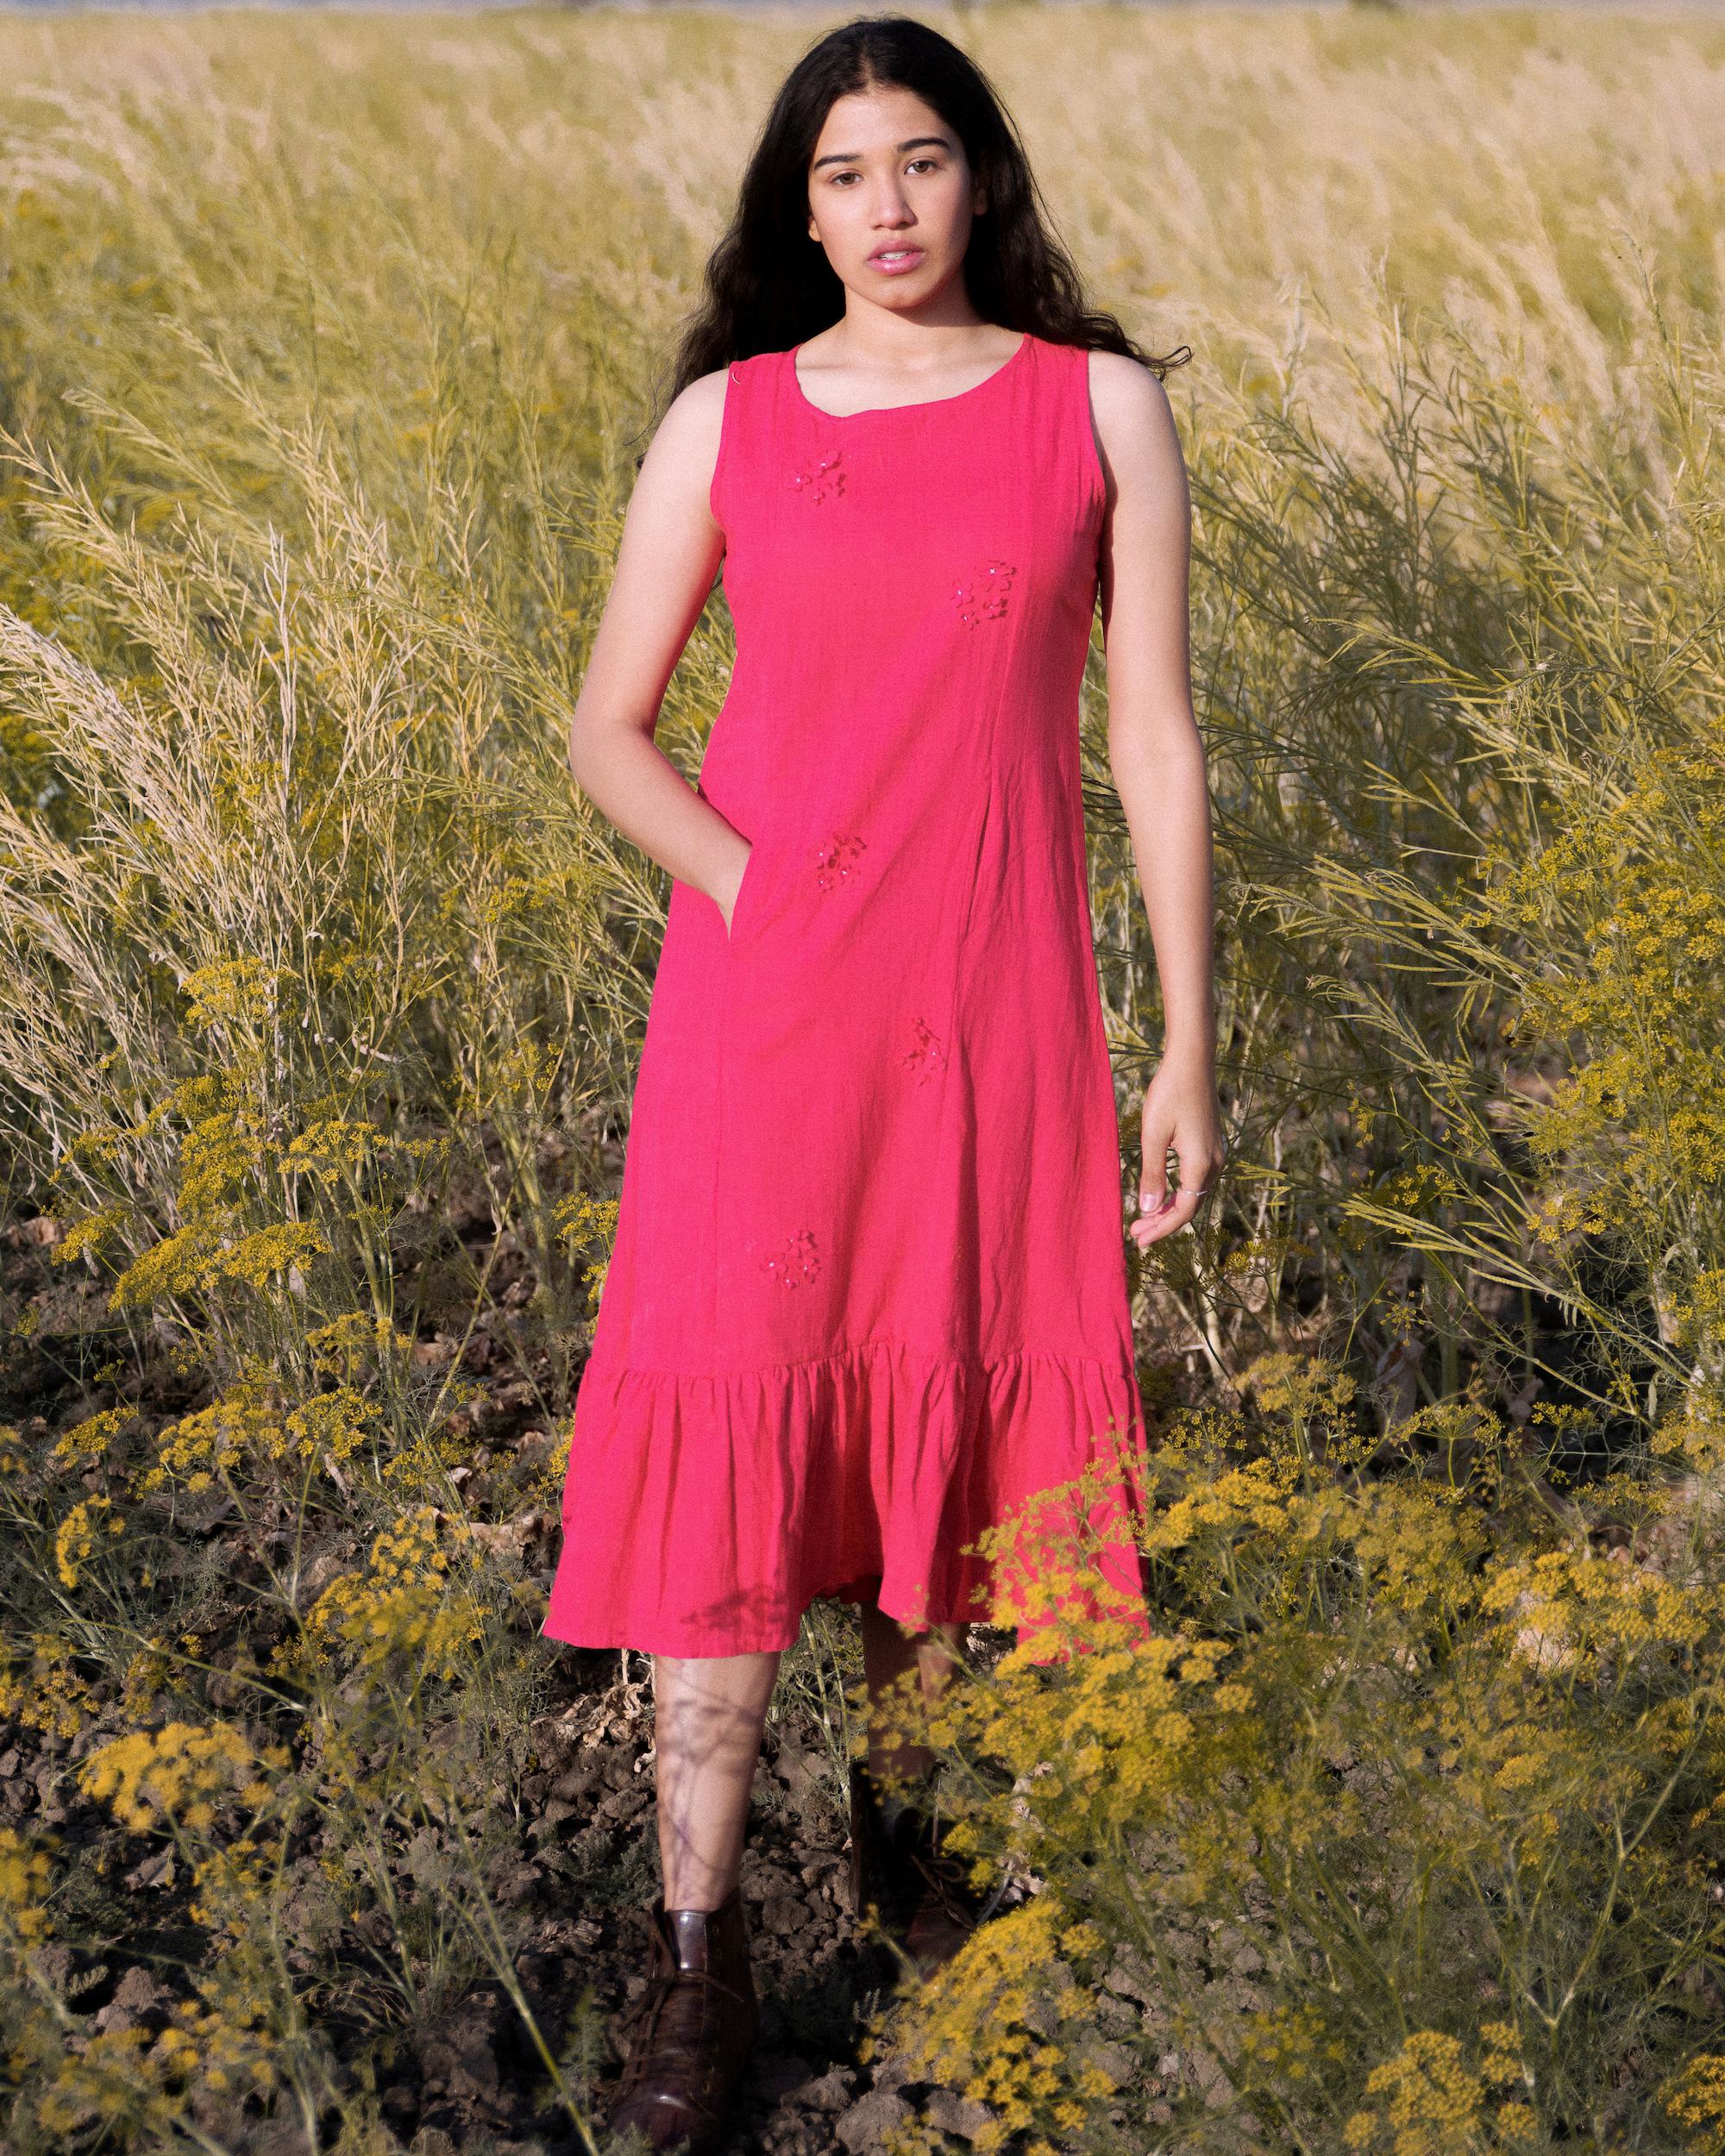 Crimson sleeveless floral dress